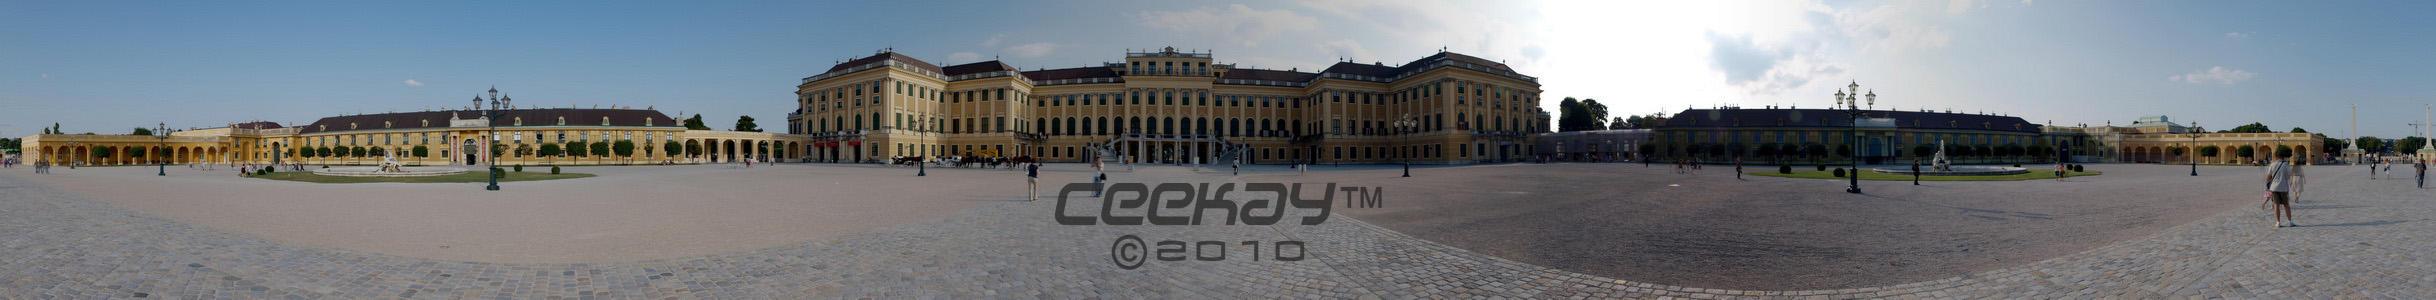 Schoenbrunn Palace - 360 by ceekayHU